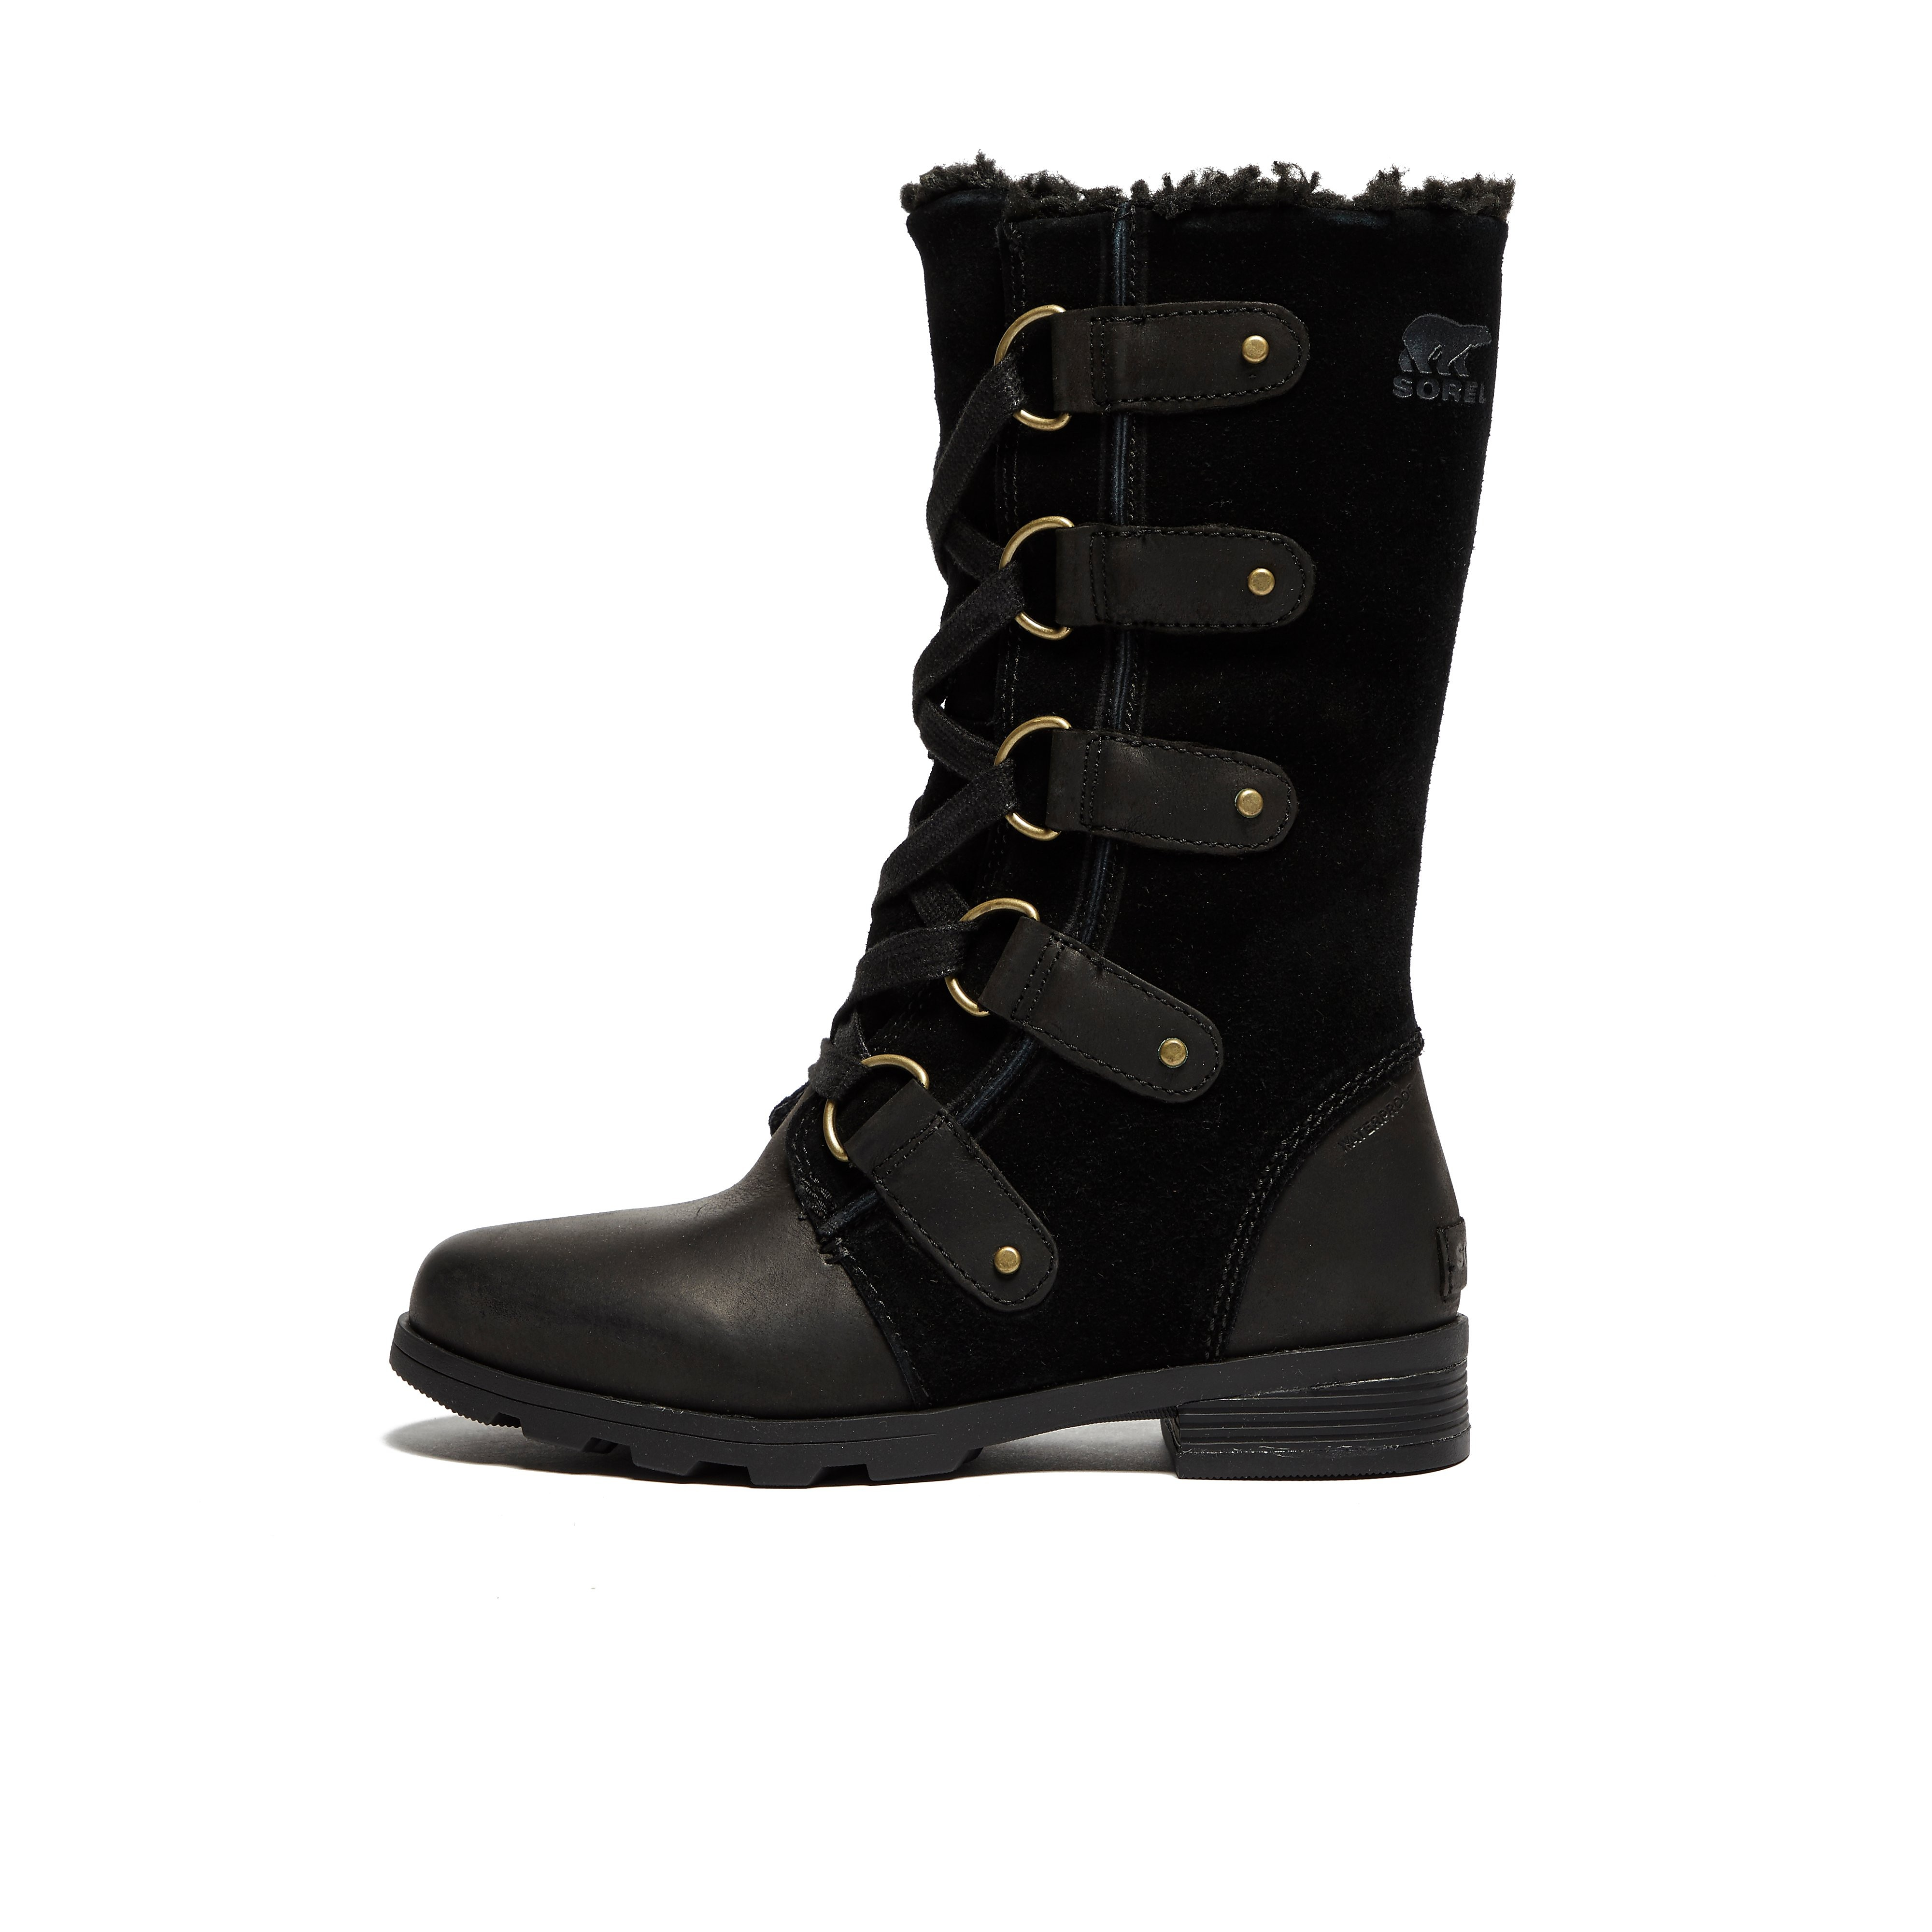 Sorel Emelie Lace Up Women's Boot